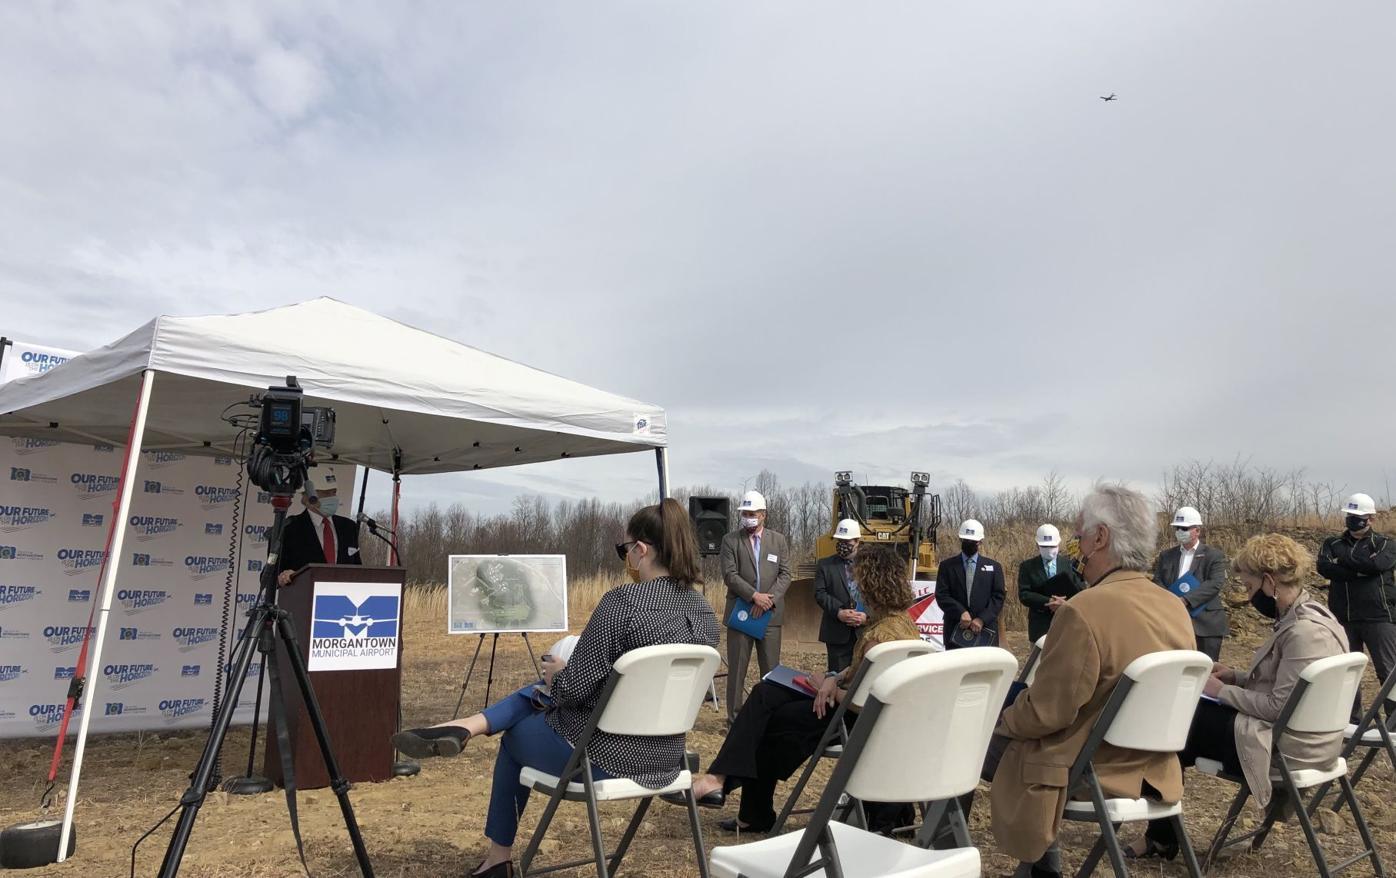 Morgantown Municipal Airport runway extension groundbreaking ceremony